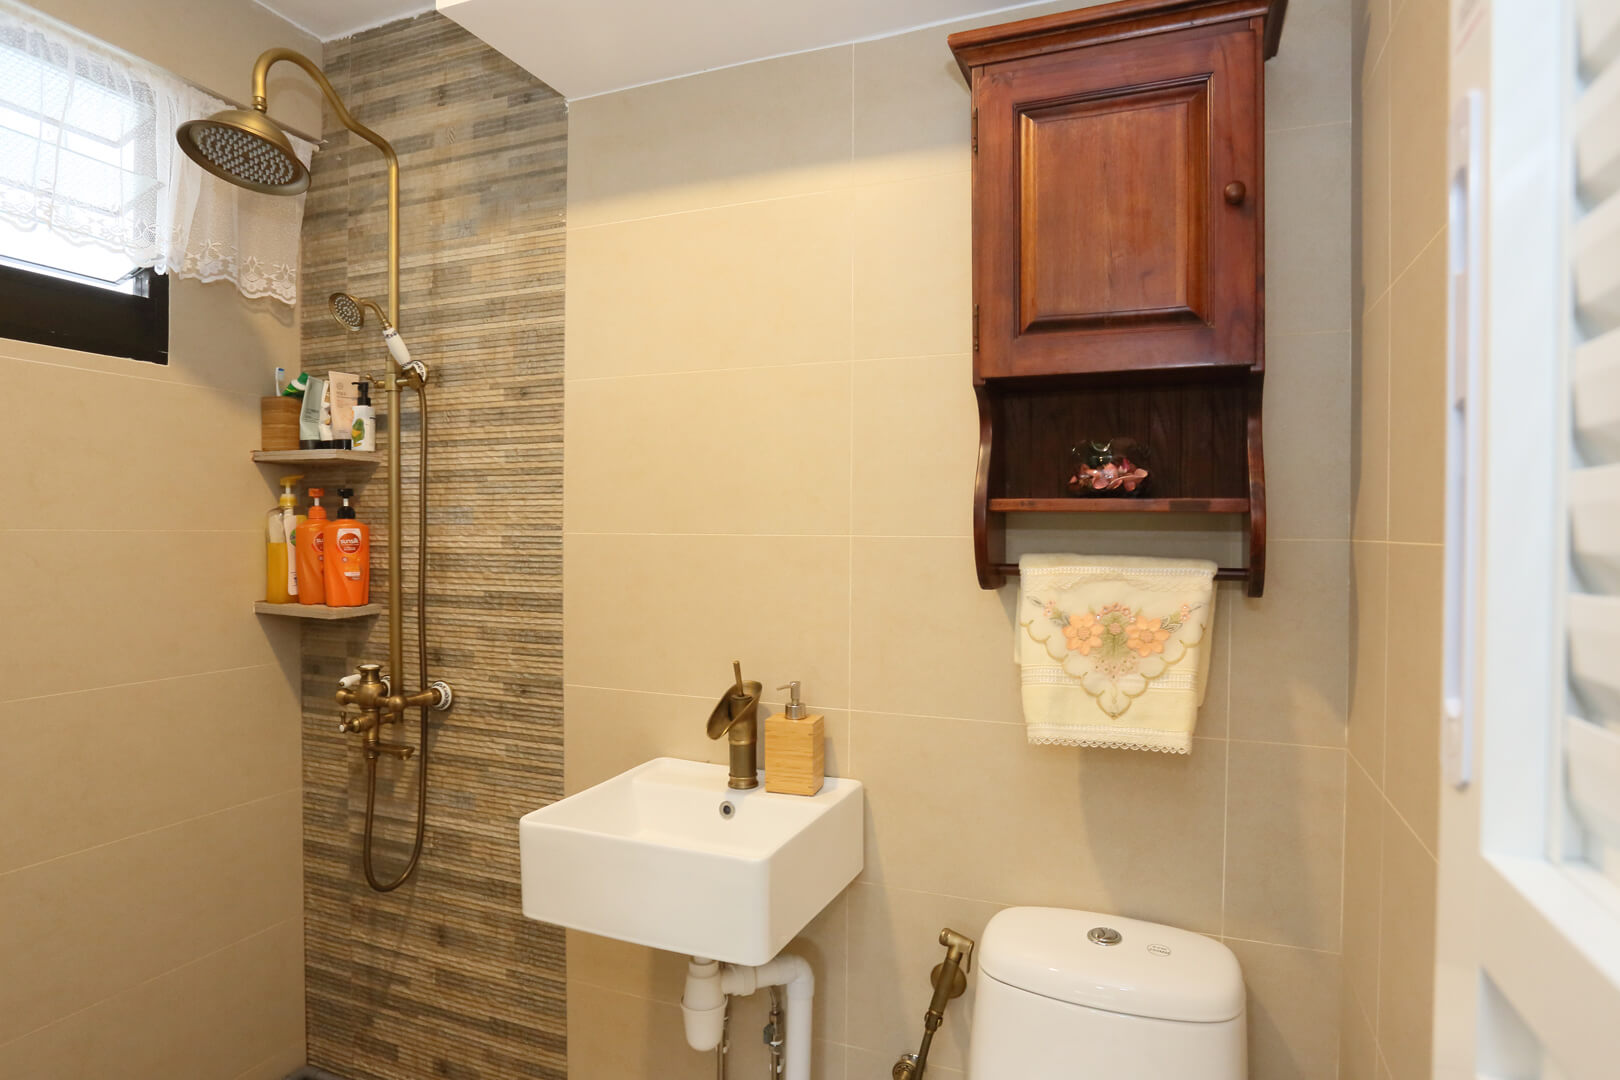 Country Chic Ambiance Interior Design Room Masteroom Washroom With Lighting